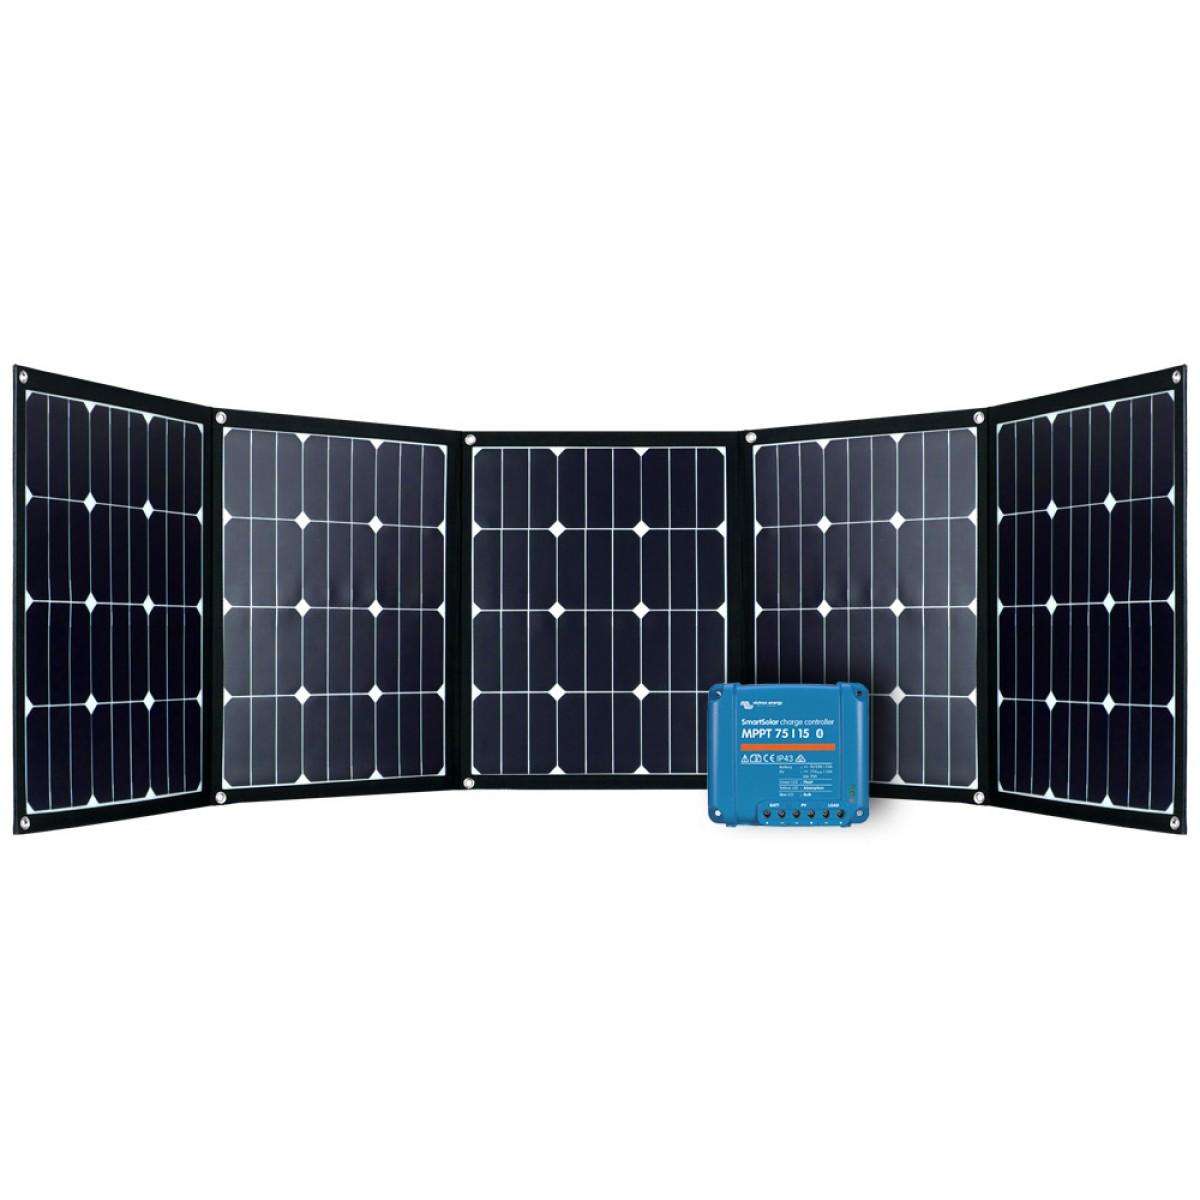 10W Faltbares Solarmodul FSP 10 Ultra 110V MPPT 10A Victron Smart